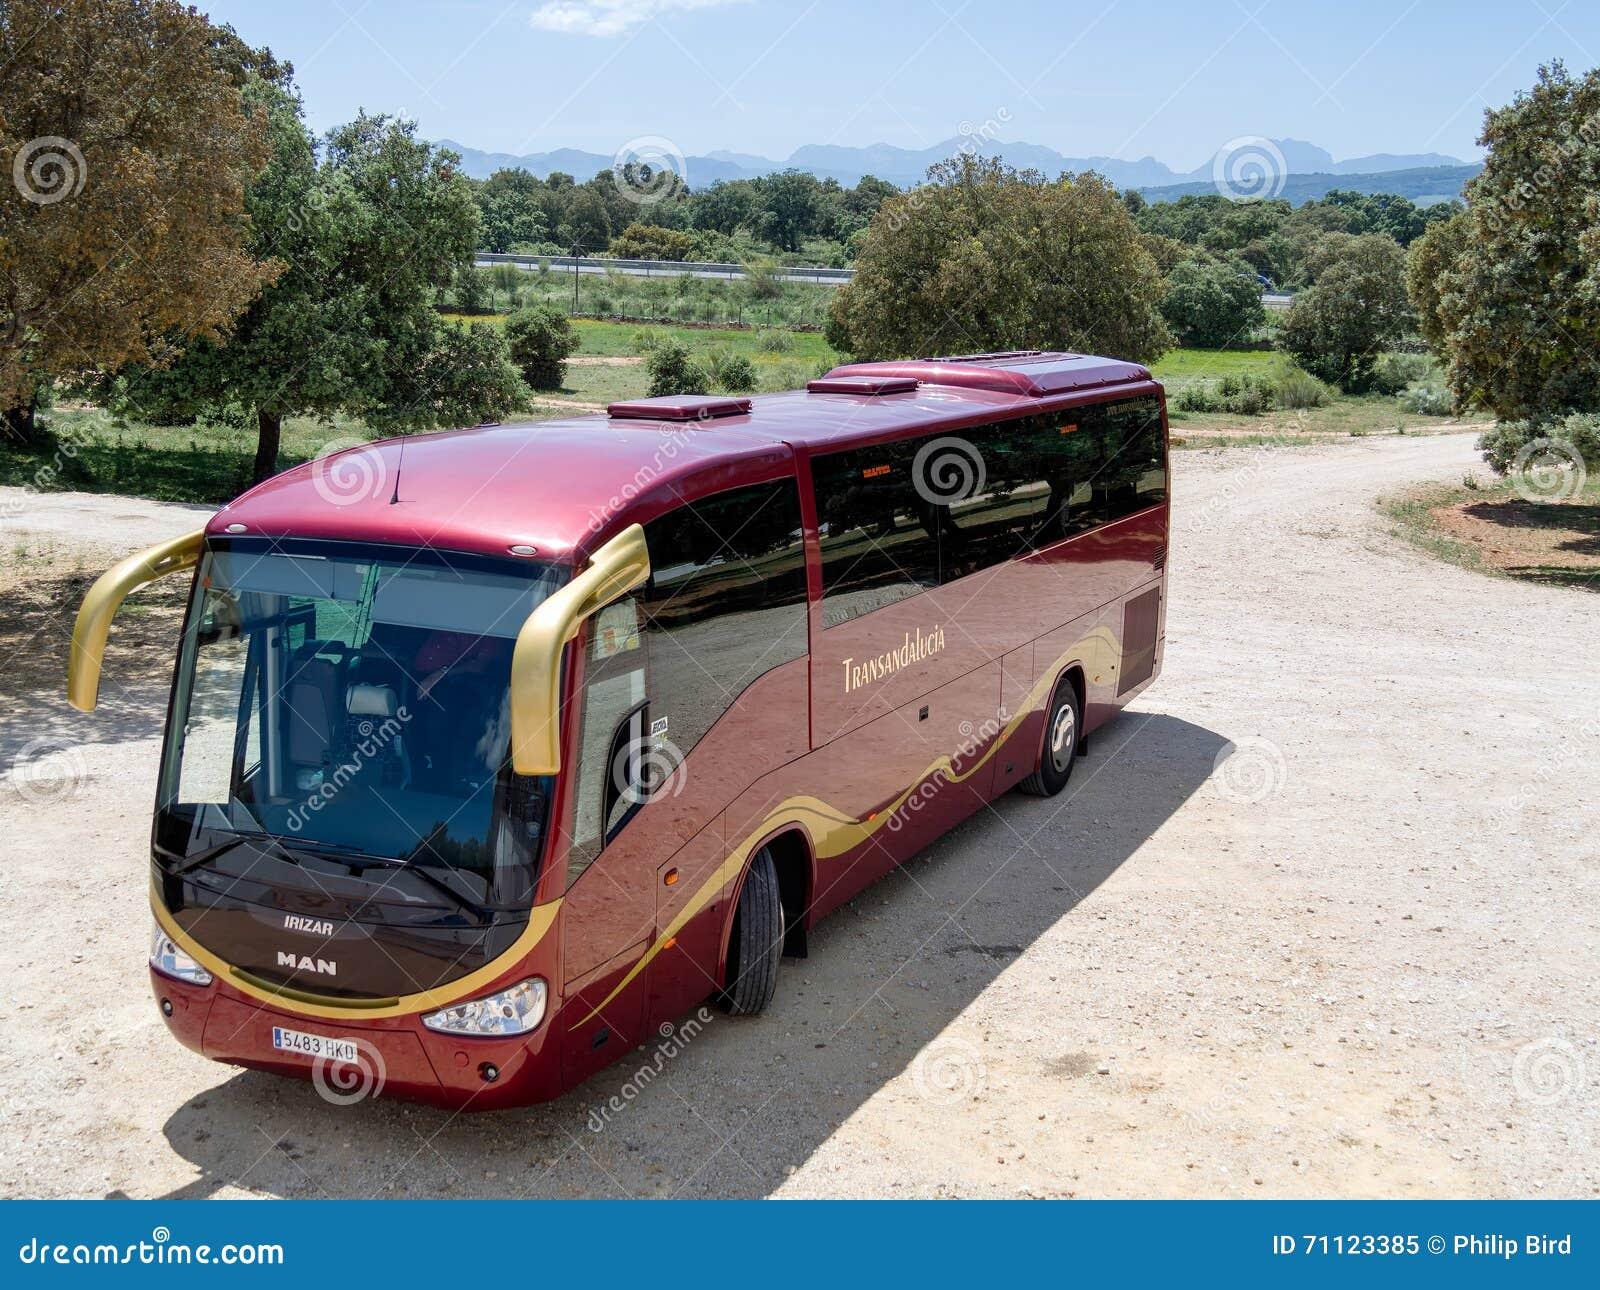 RONDA, ANDALUCIA/SPAIN - 8 ΜΑΐΟΥ: Λεωφορείο Transanadalucia που σταθμεύουν